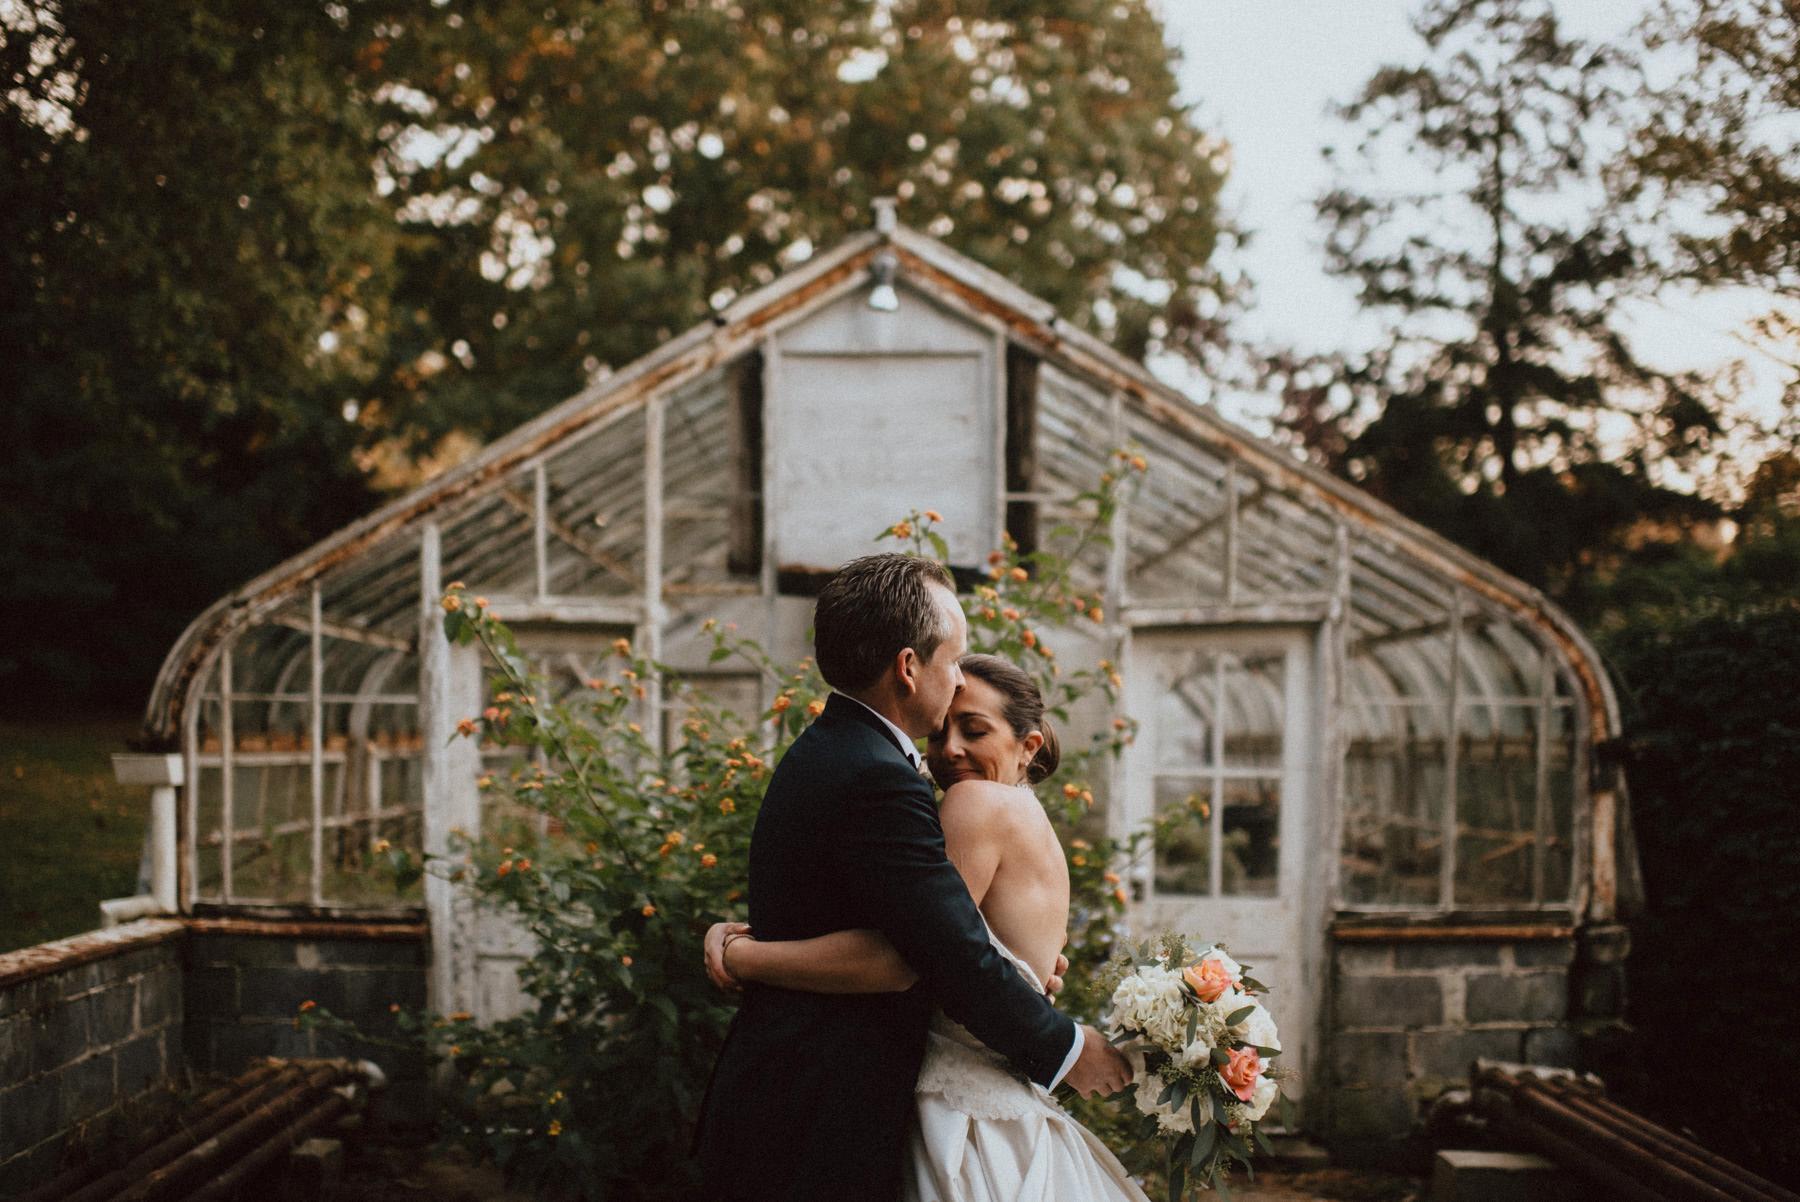 196-appleford-estate-wedding-8-2.jpg